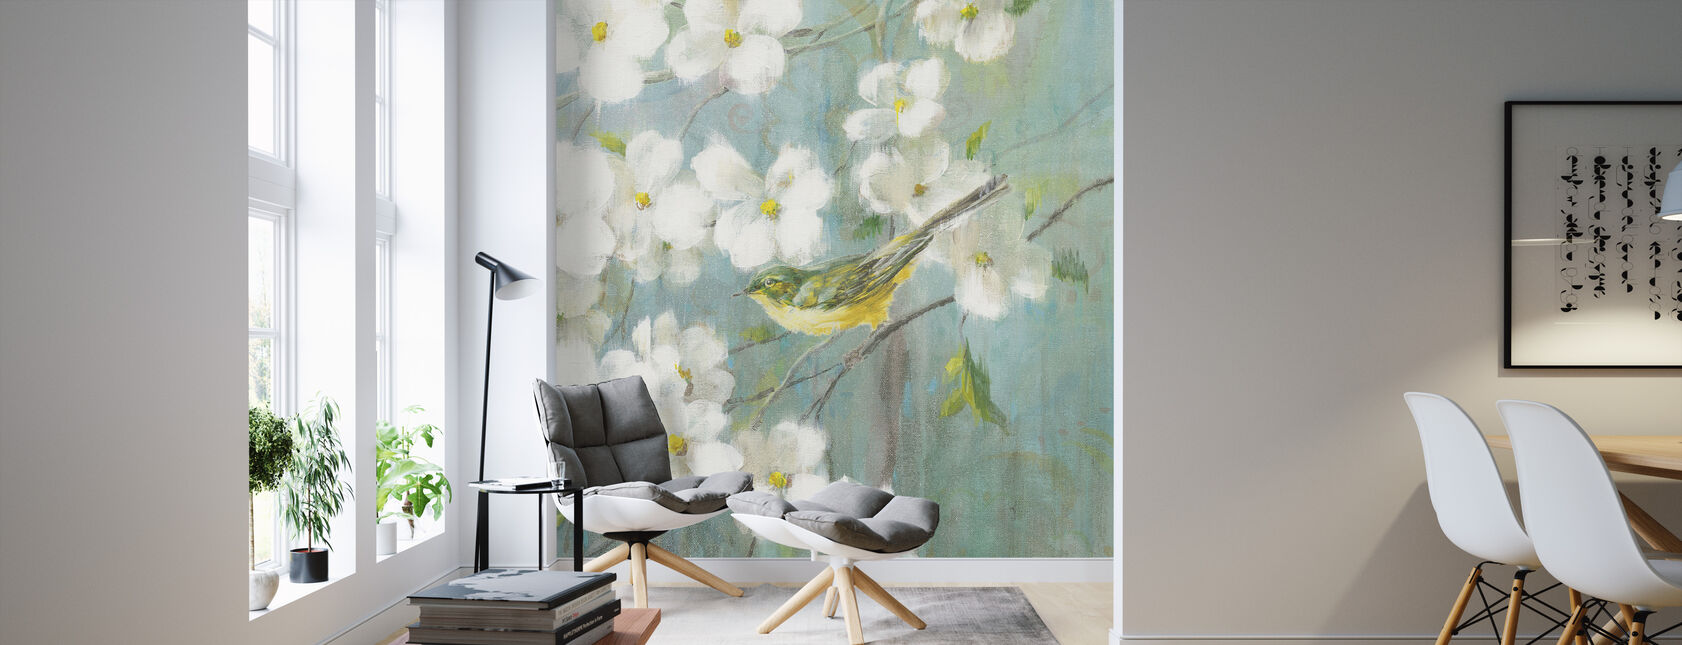 Spring Dream 4 - Wallpaper - Living Room